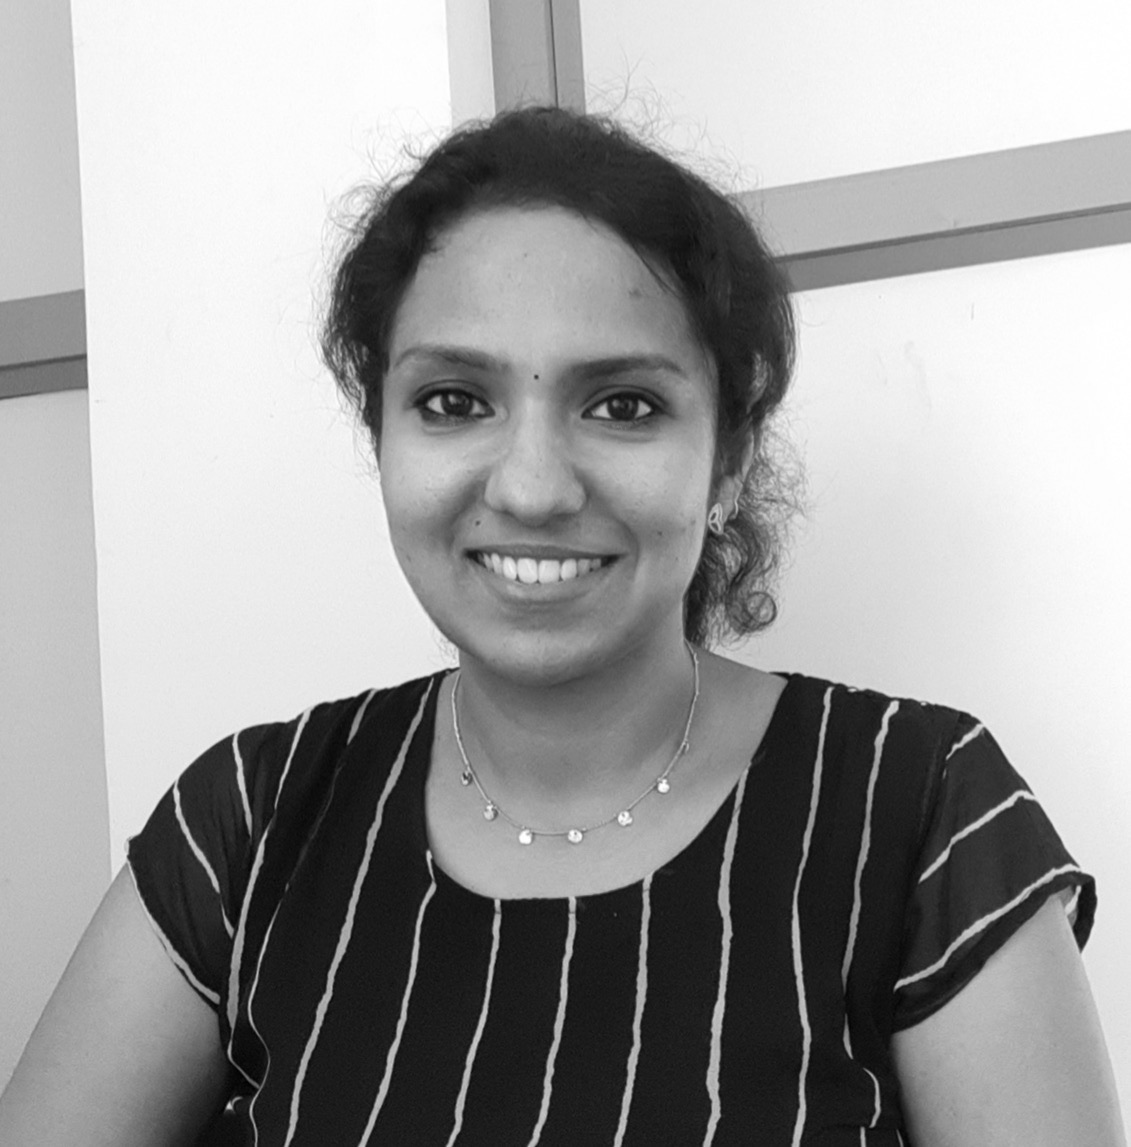 Picture of Laxme Janardhana